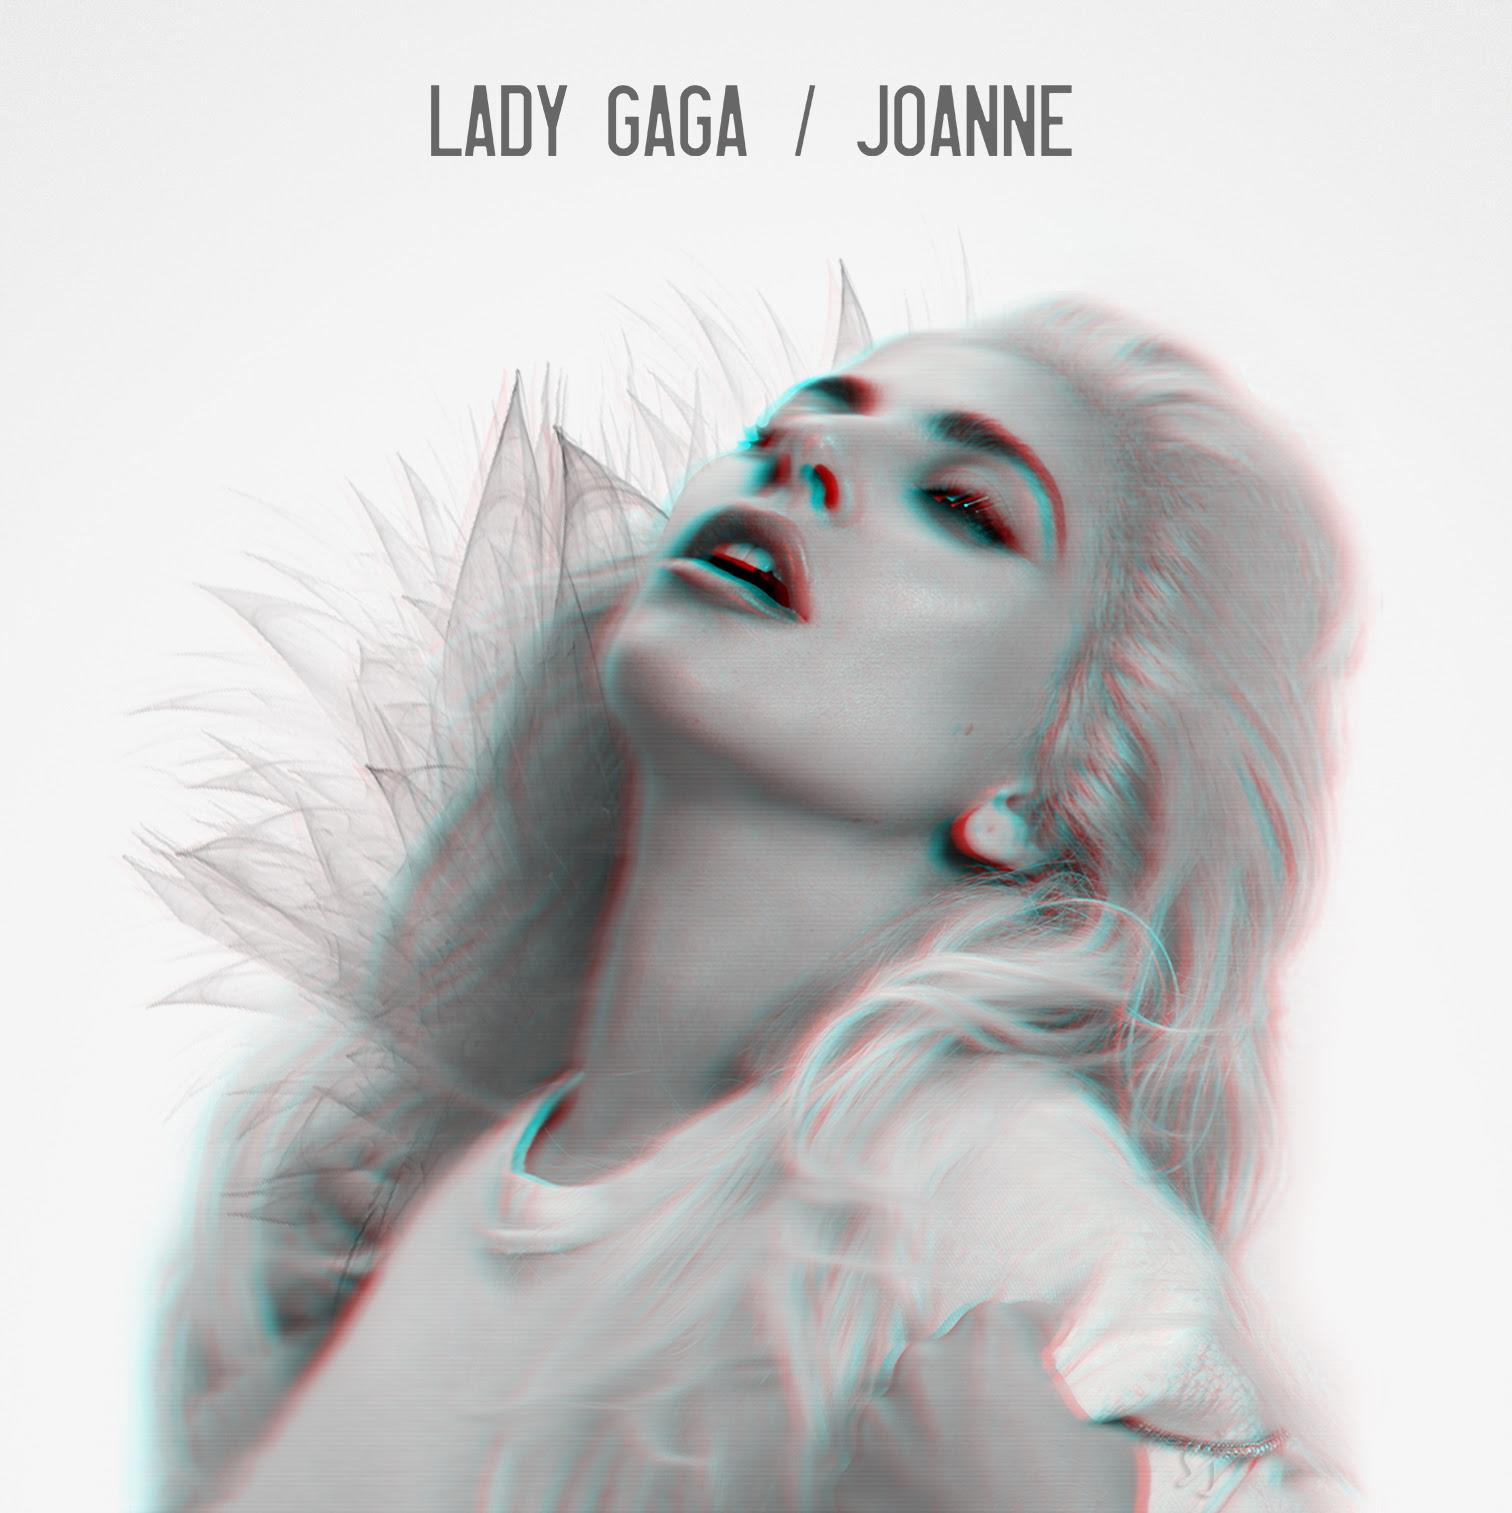 Joanne fanmade album cover - Fan Art - Gaga Daily